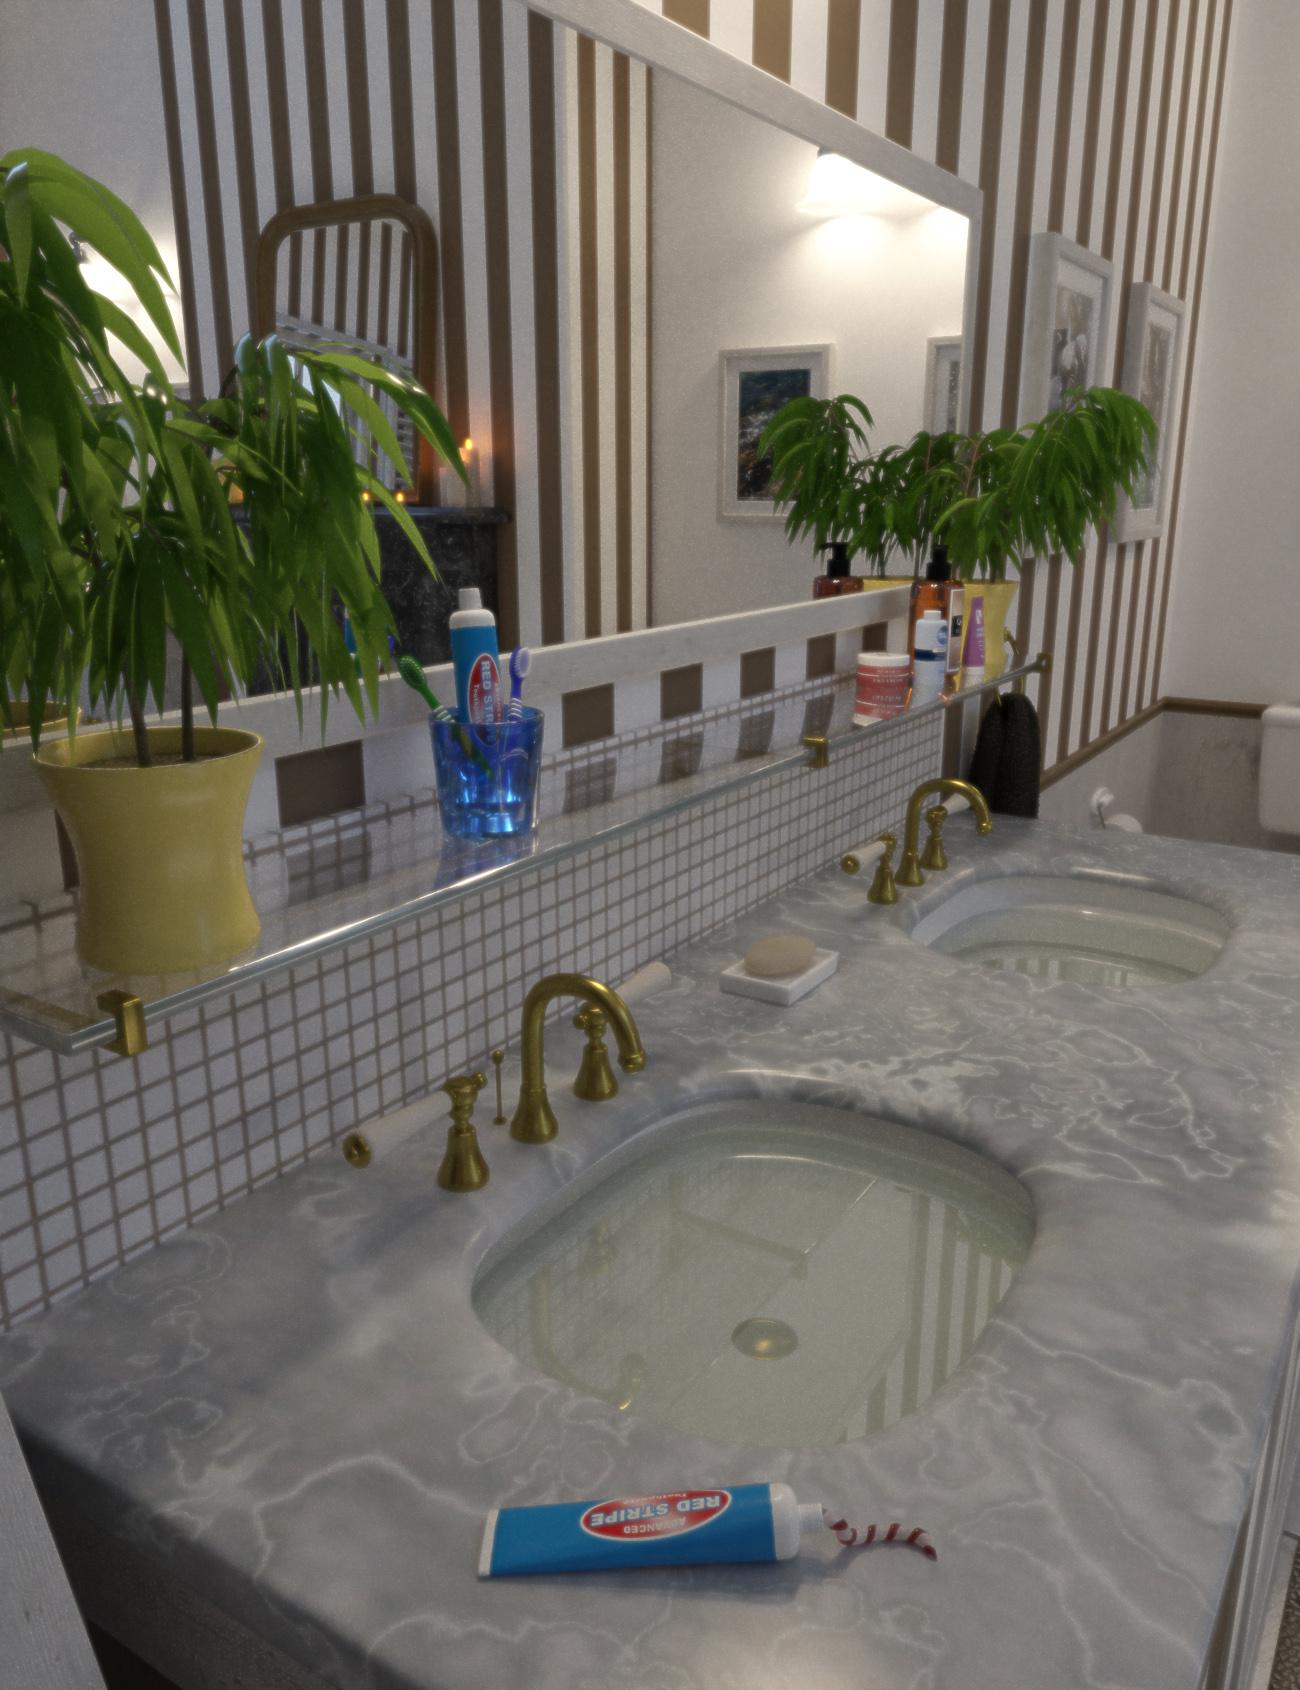 Bathroom Detail - Predatron 3D Models